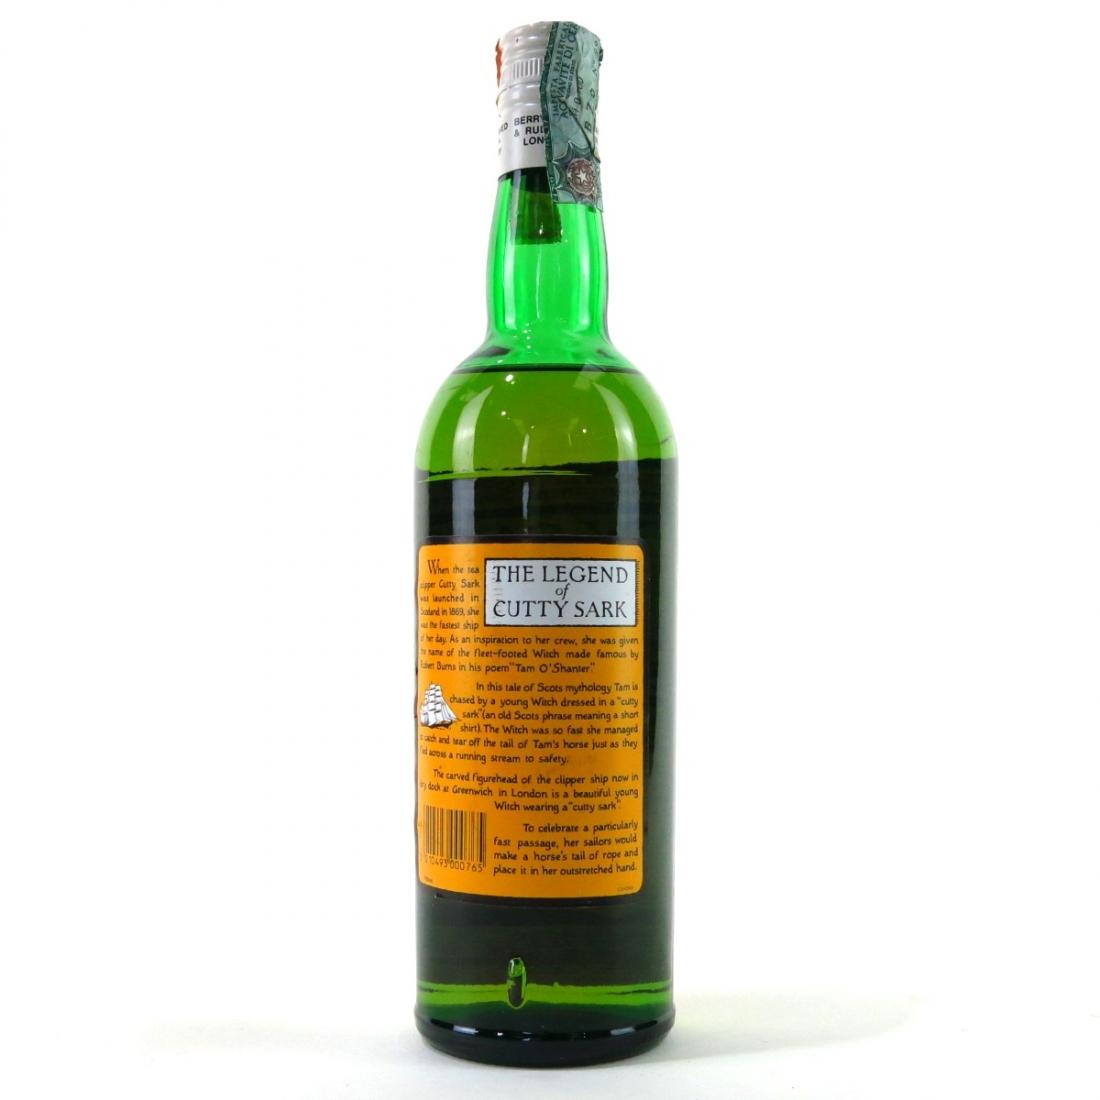 Cutty Sark Blended Scotch Whisky 1990s